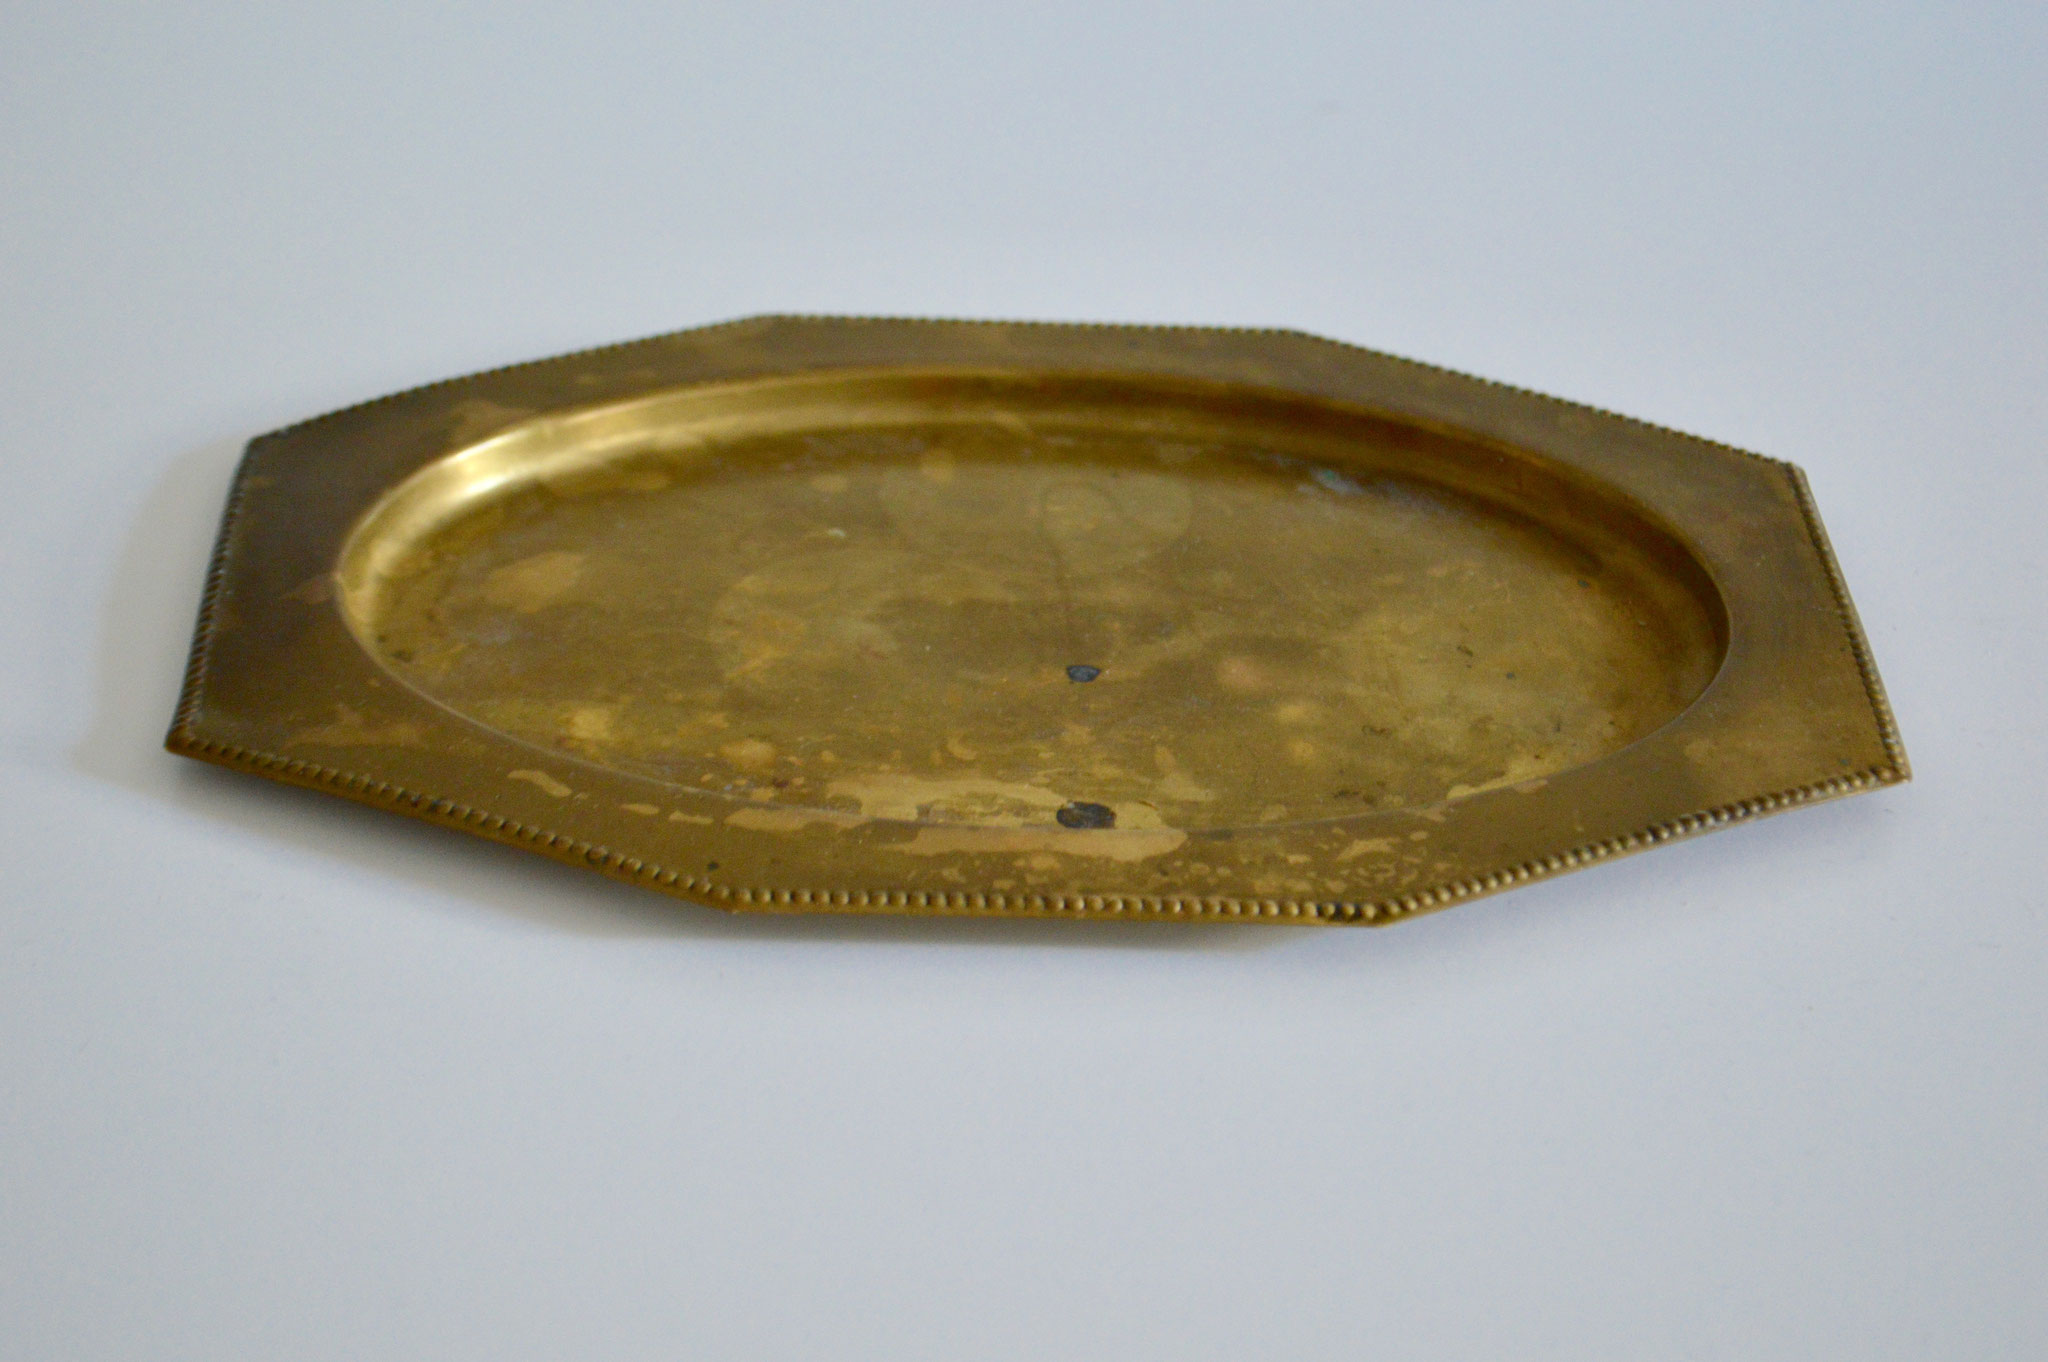 G) € 3, Länge ca. 21 cm, Breite ca. 14 cm